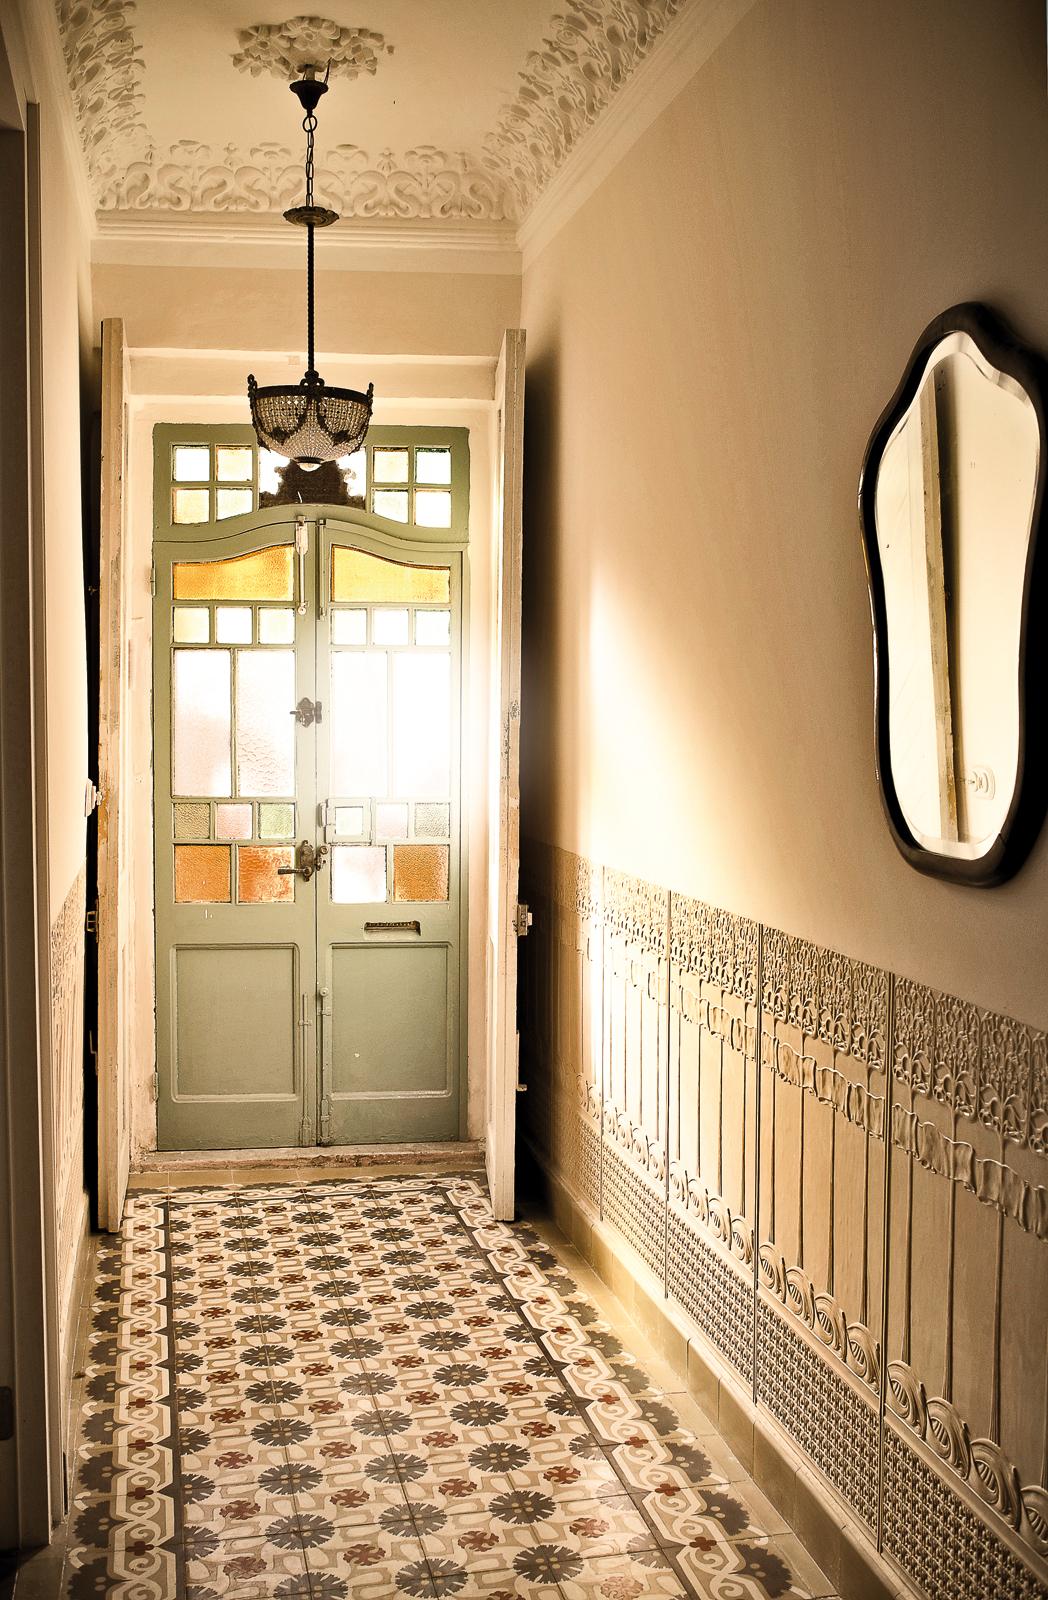 kreidefarbe-provencegruen-101-Eingang-zementfliesen-terrazzofliesen-viaplatten- | Kreidefarbe Provencegrün 60 ml